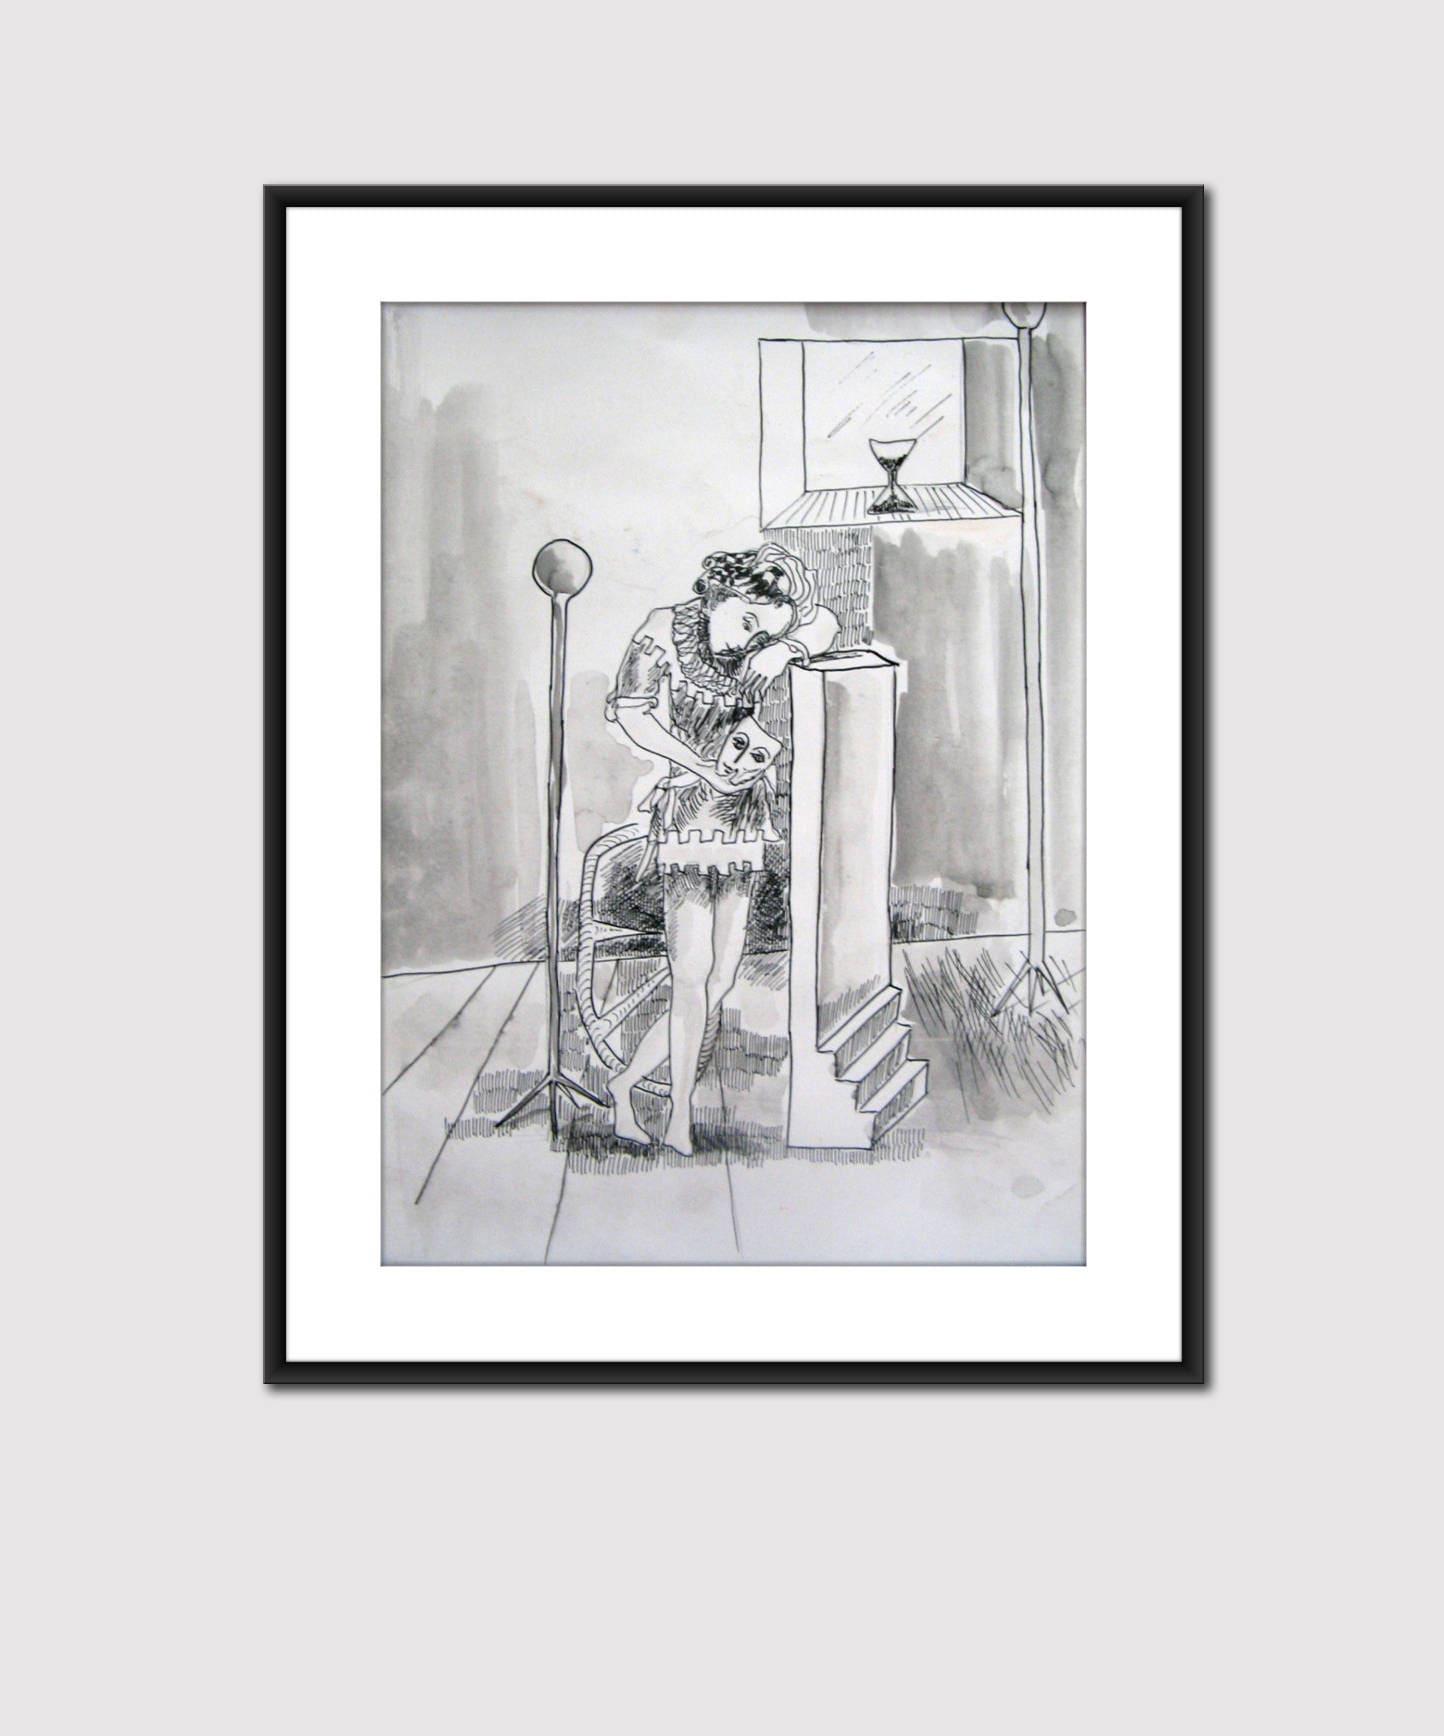 Sad clown black ink original painting on paper drawing on paper original in black white colors wall art artwork for interior design